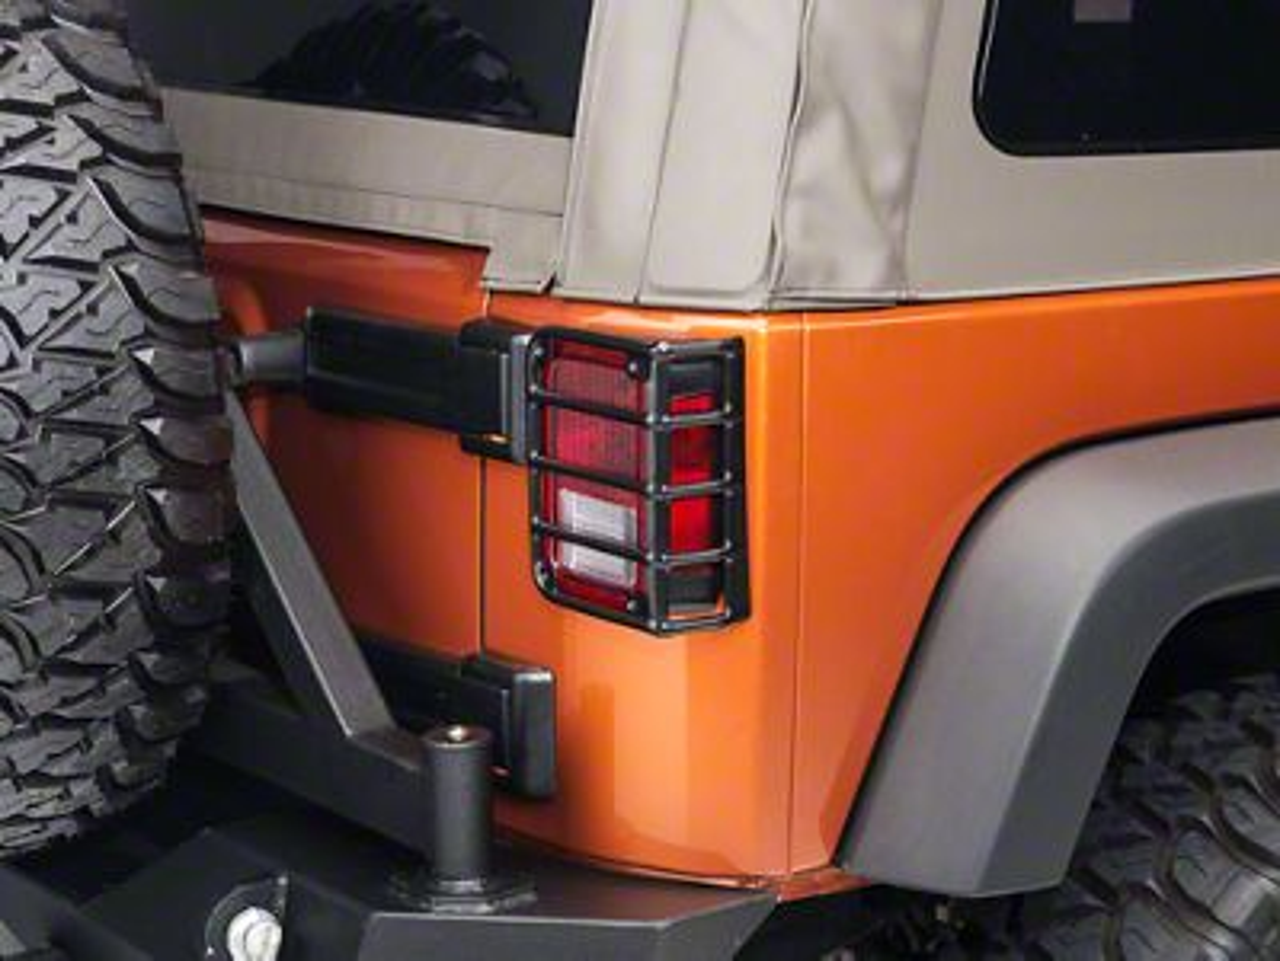 Outland 391122601 Black Euro Tail Light Guard for Jeep CJ//YJ//TJ Wrangler